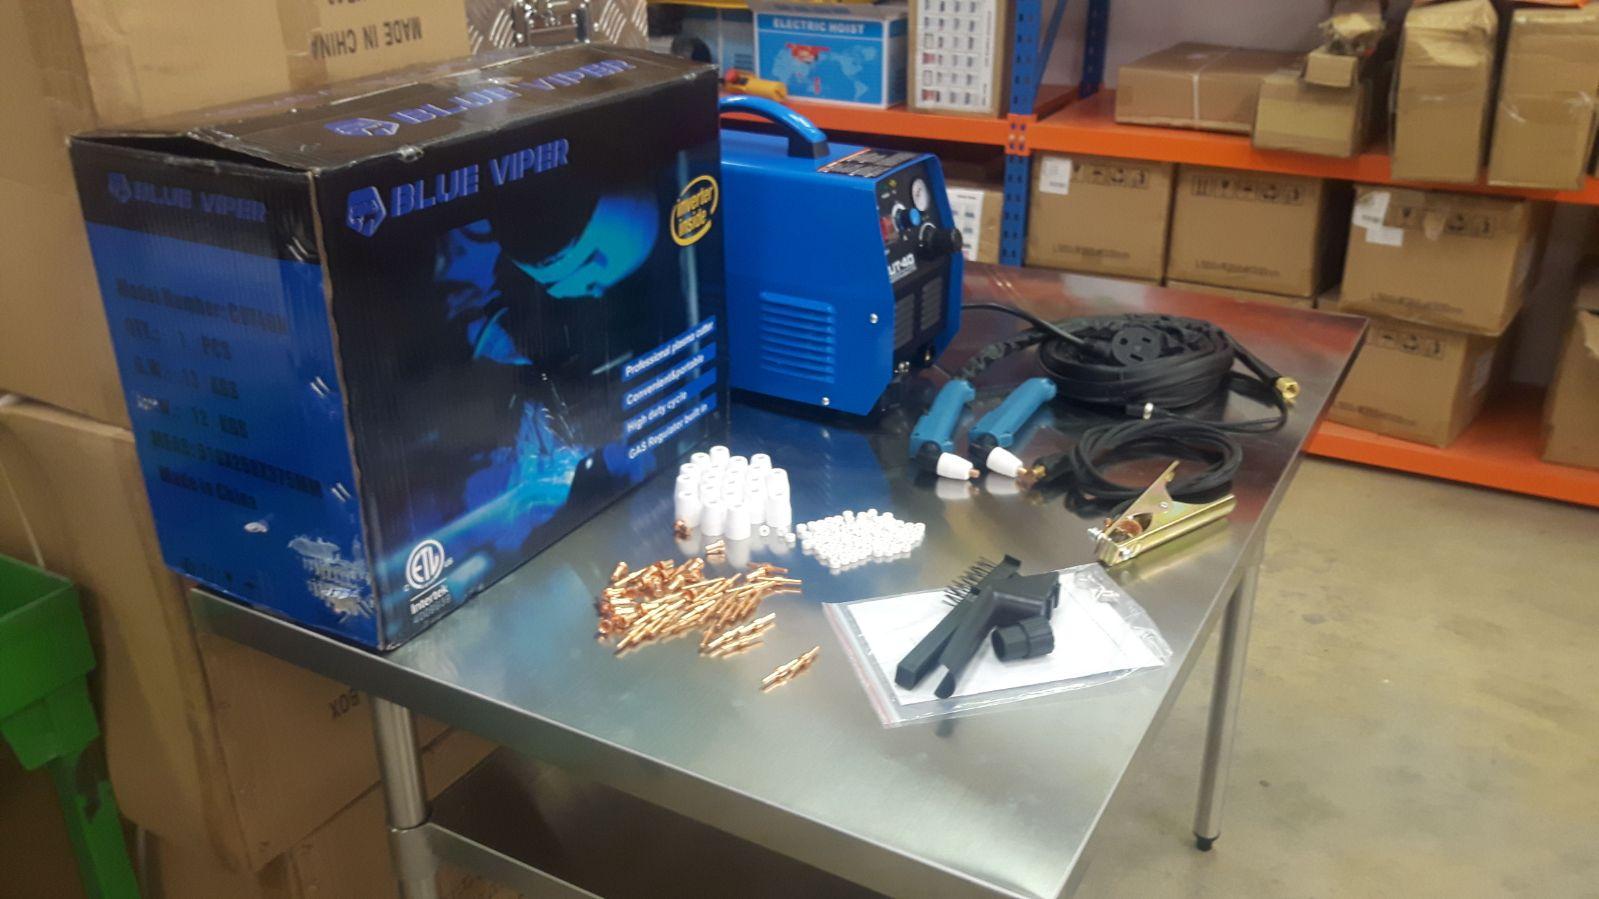 Blue Viper Dual Voltage Set Blue Viper Plasma Cutter